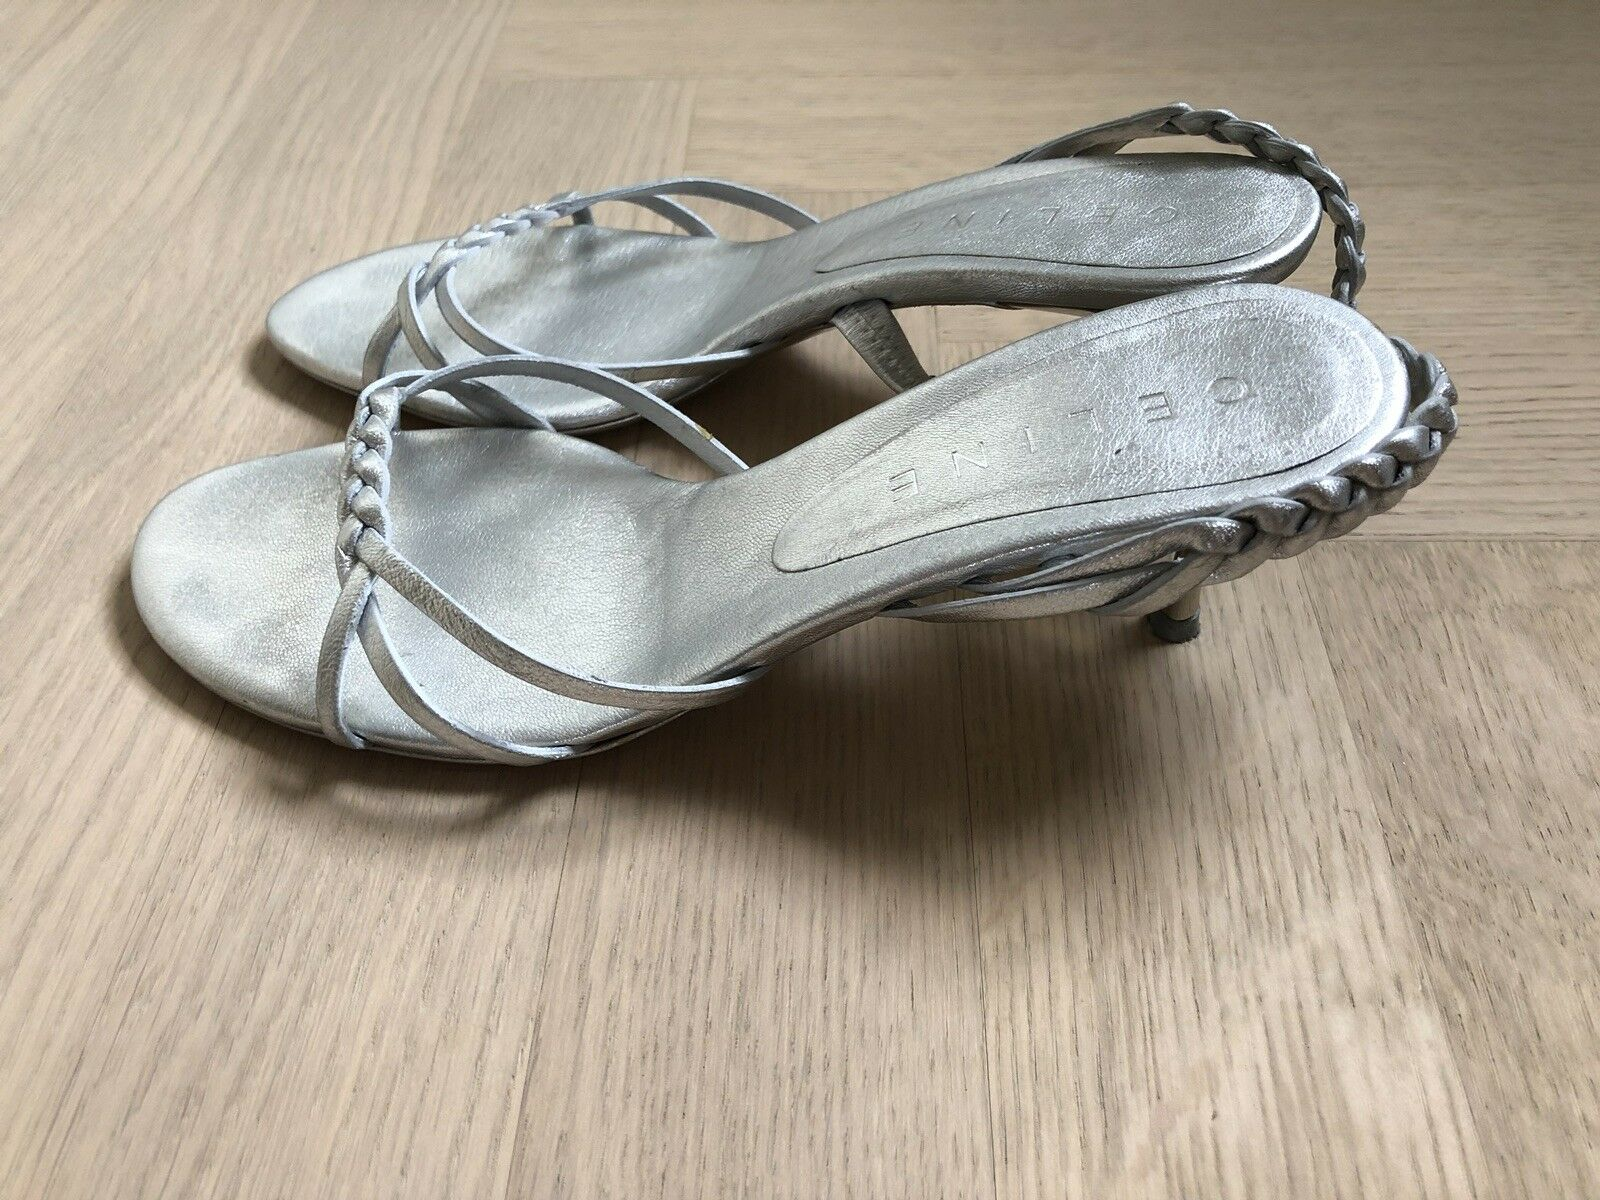 Celine  Sandalen  Silber  37,5 wie neu  Klassiker  Jades